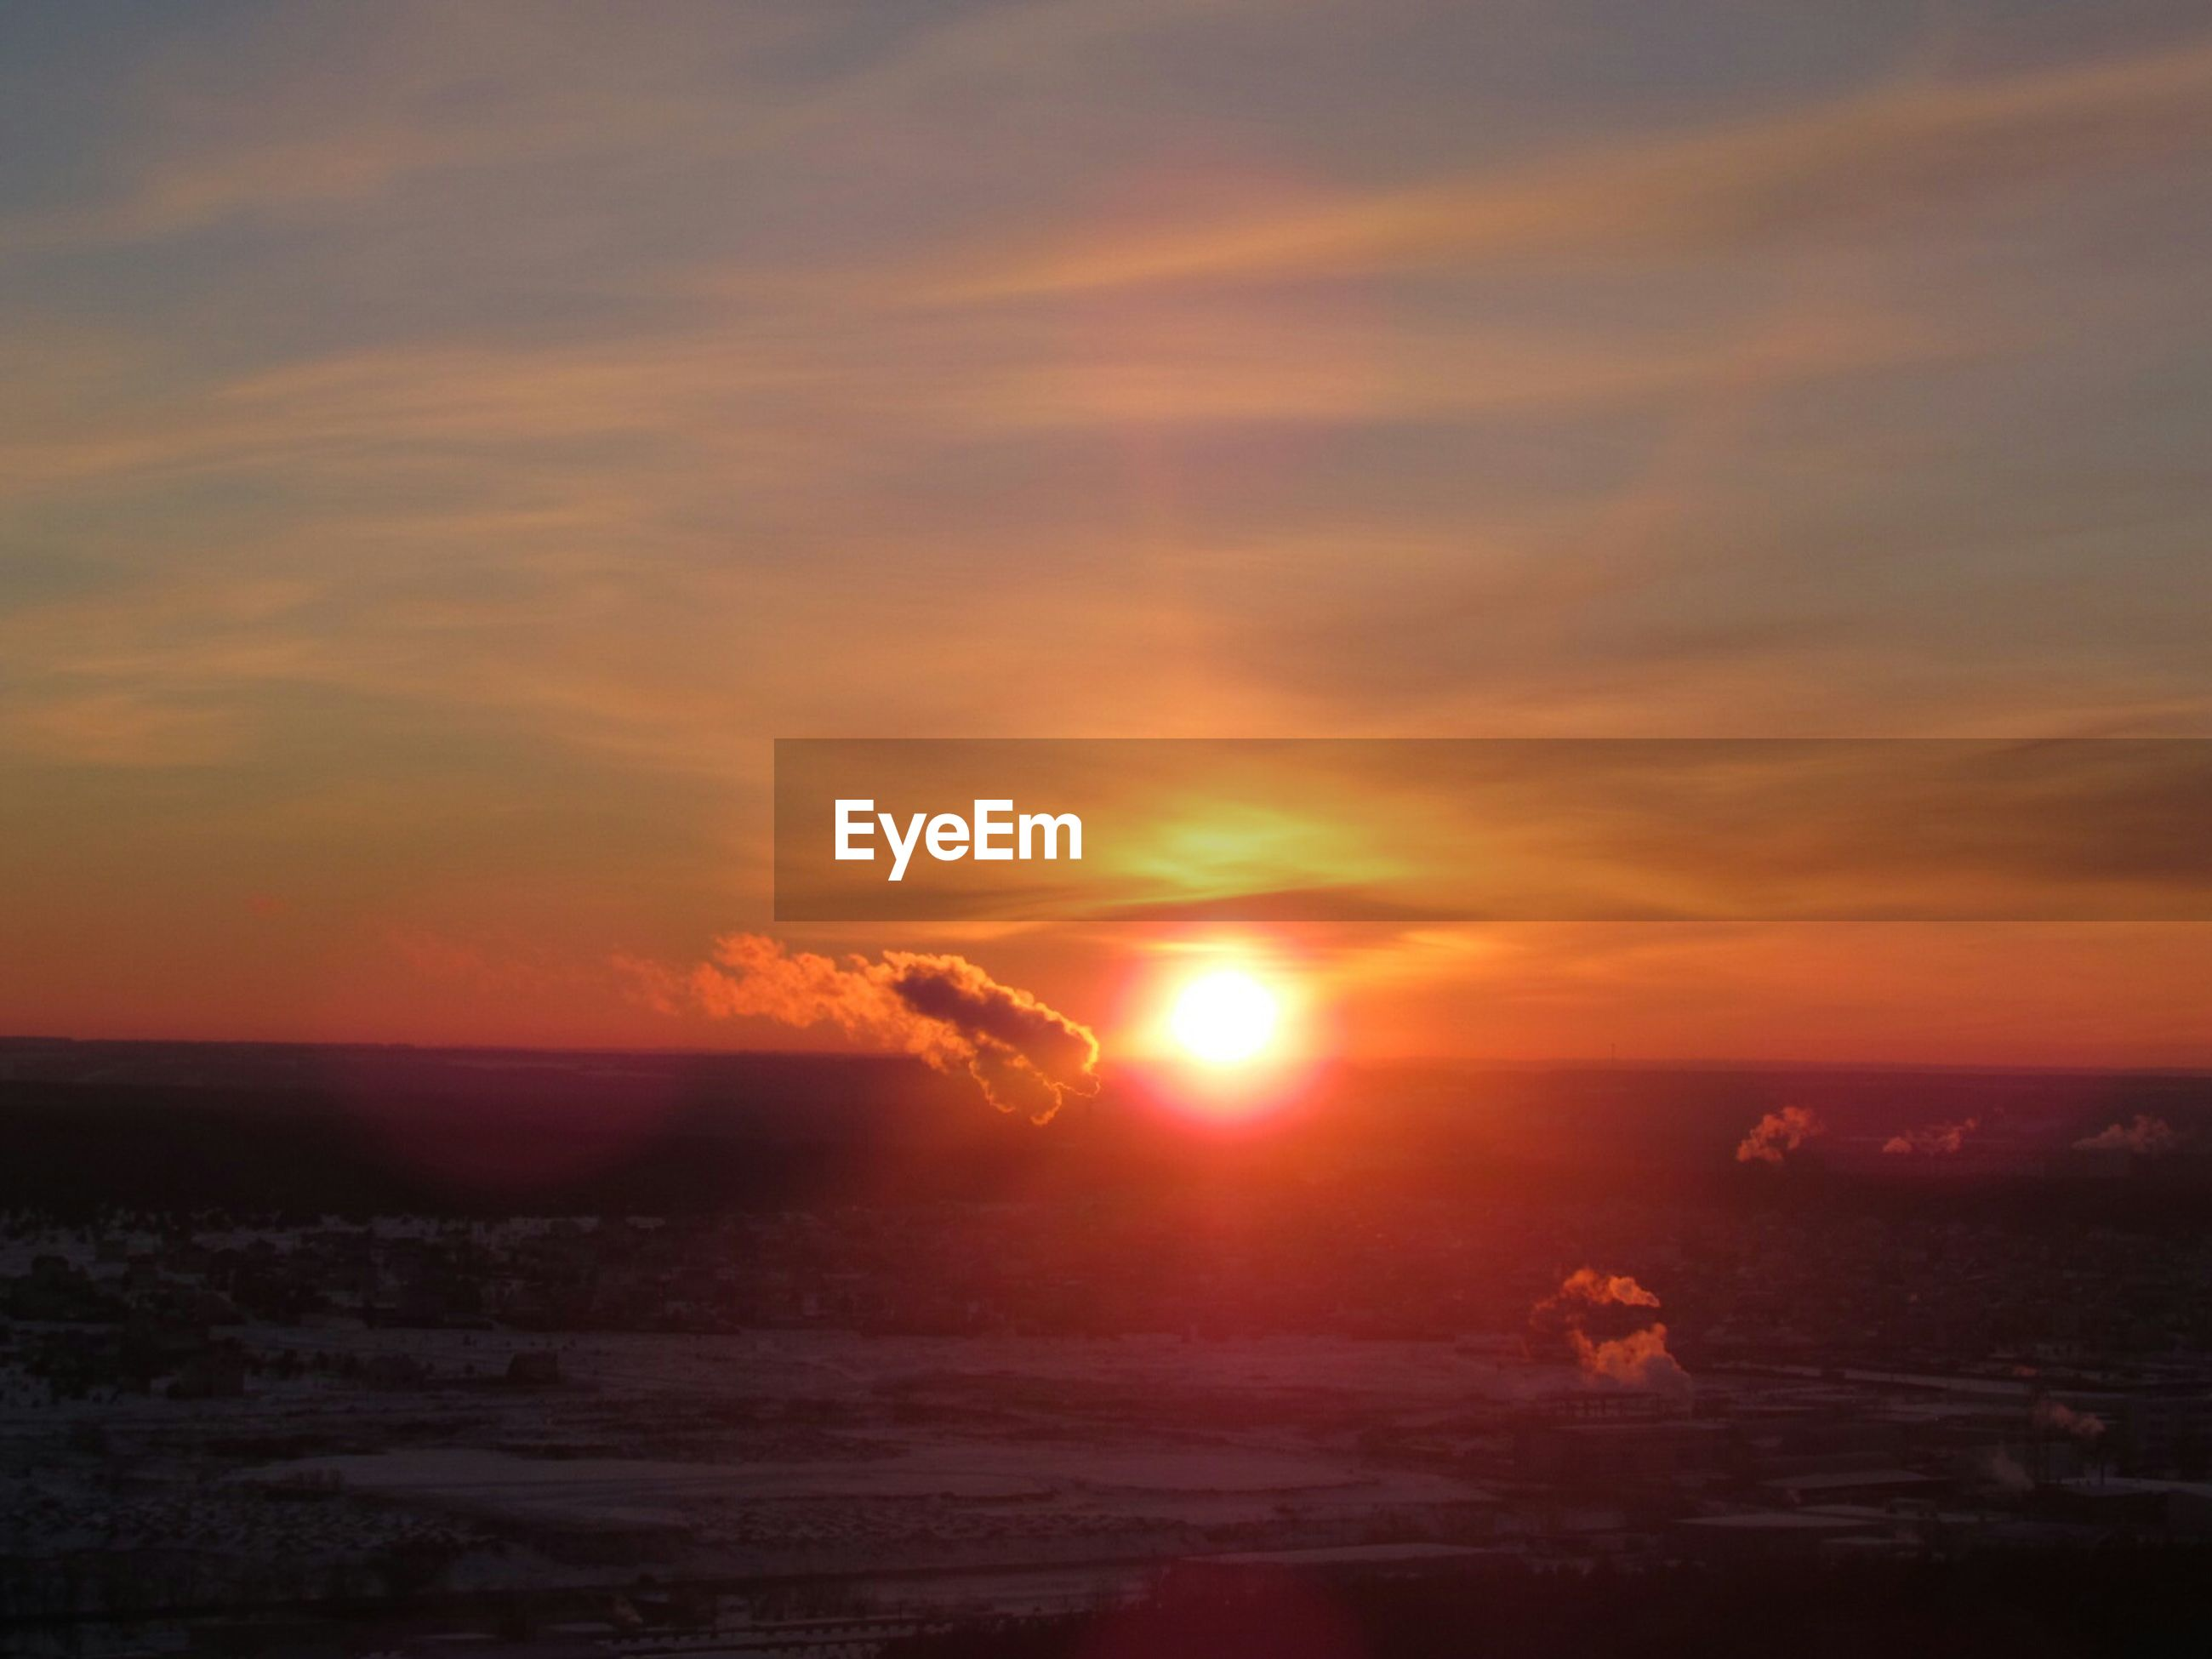 sunset, sun, orange color, scenics, tranquil scene, beauty in nature, tranquility, sky, idyllic, nature, landscape, cloud - sky, silhouette, sunlight, outdoors, remote, sea, cloud, horizon over water, non-urban scene